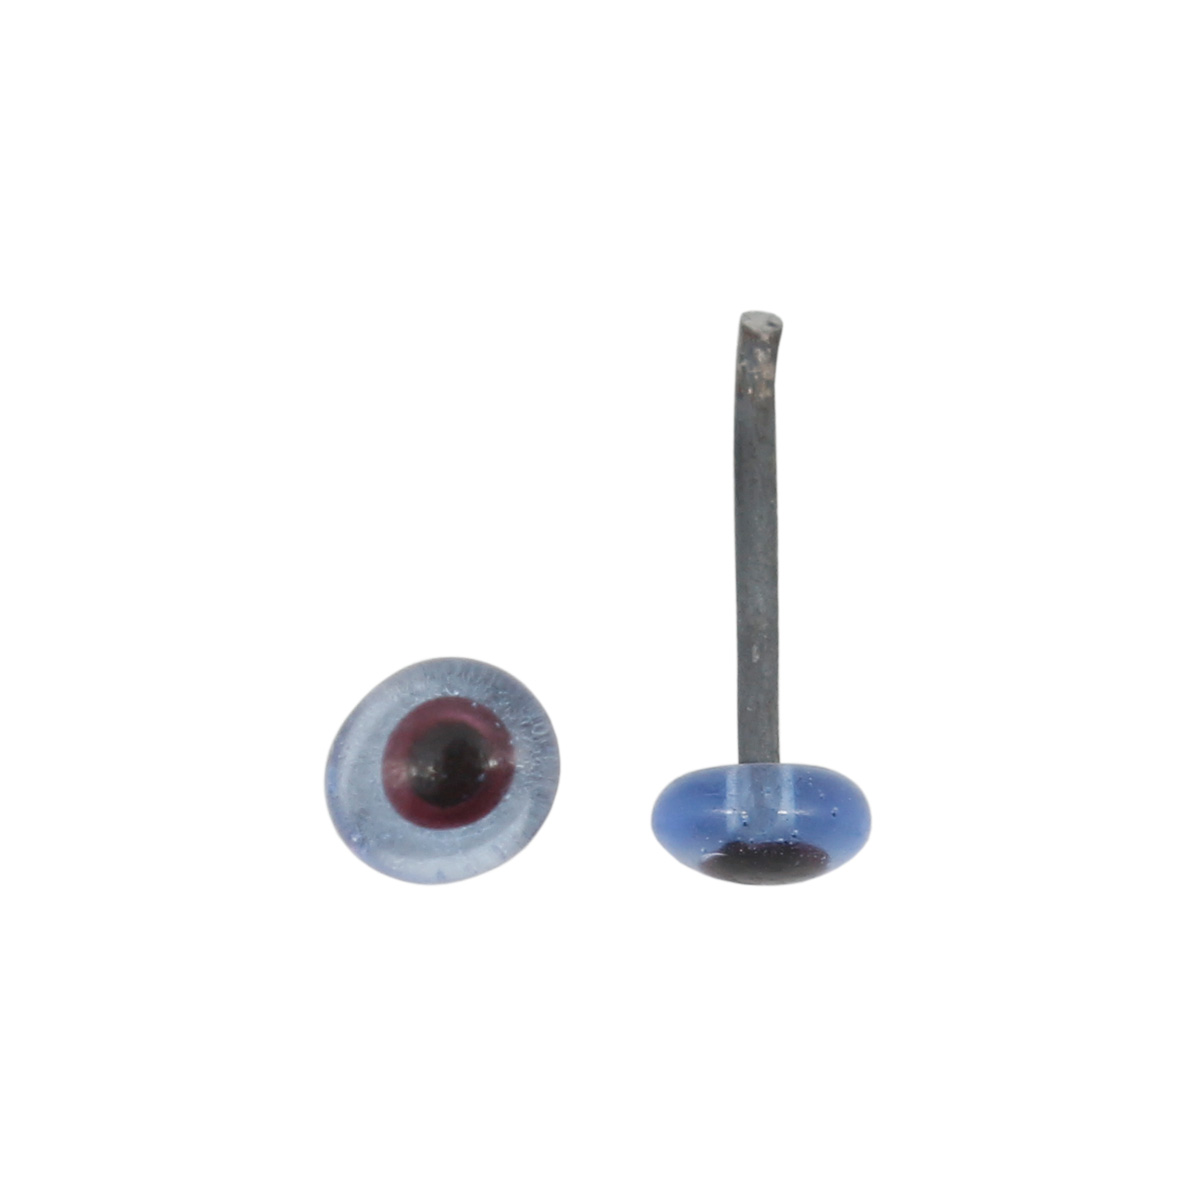 28809 Глазки 4мм на метал.ножке, упак/10шт, цв.голубой